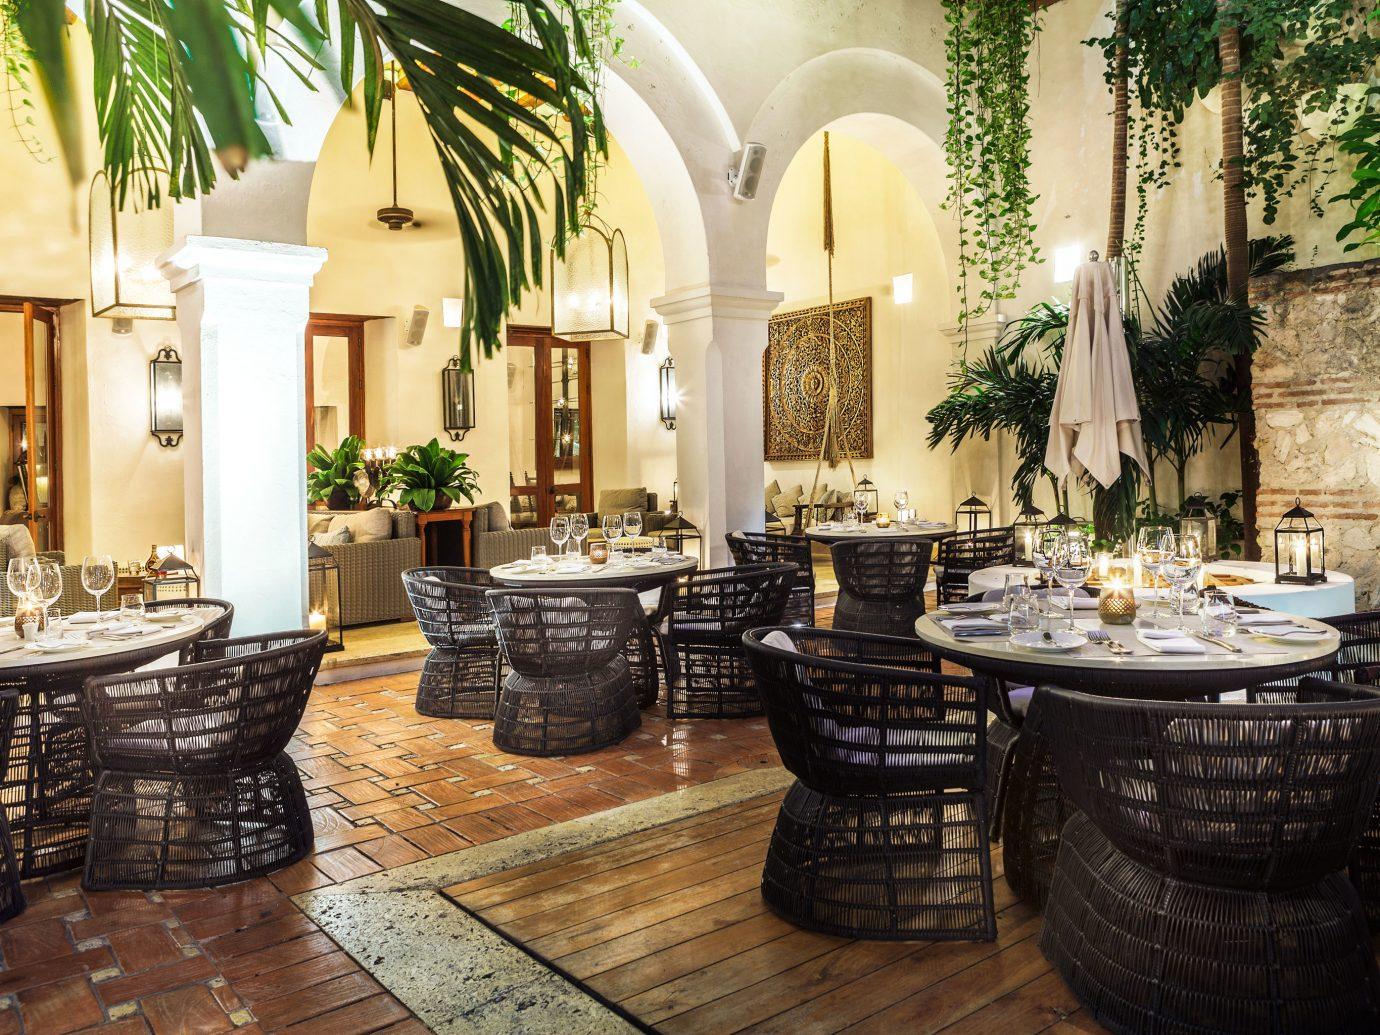 Design Dining Drink Eat Hotels Luxury Resort Romance Lobby property room estate meal home mansion living room interior design restaurant Villa stone furniture